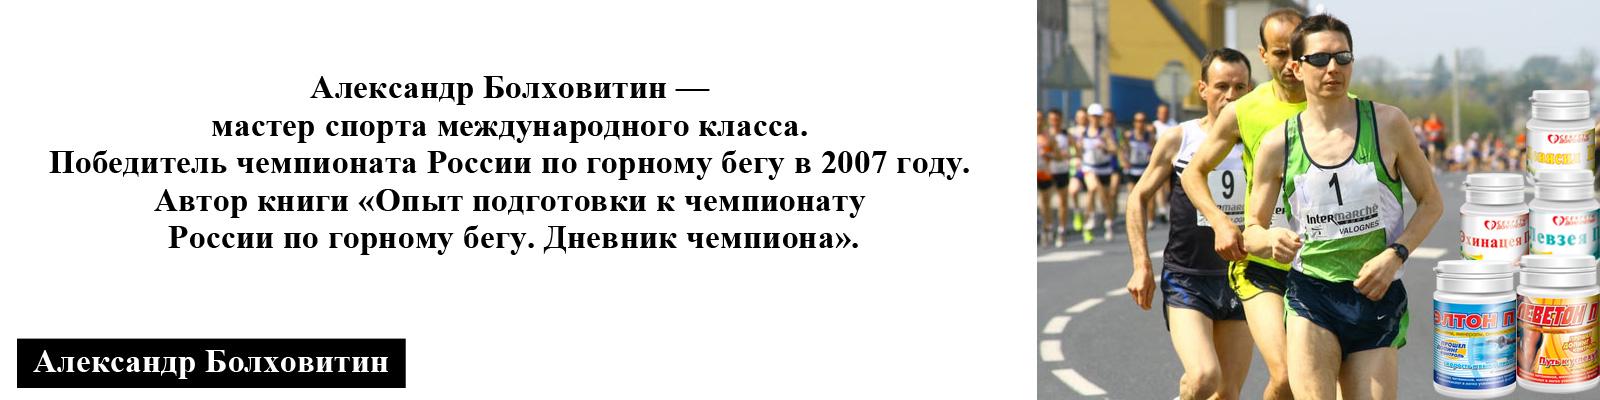 Болховитин Александр в своей книге о препаратах ООО Парафарм